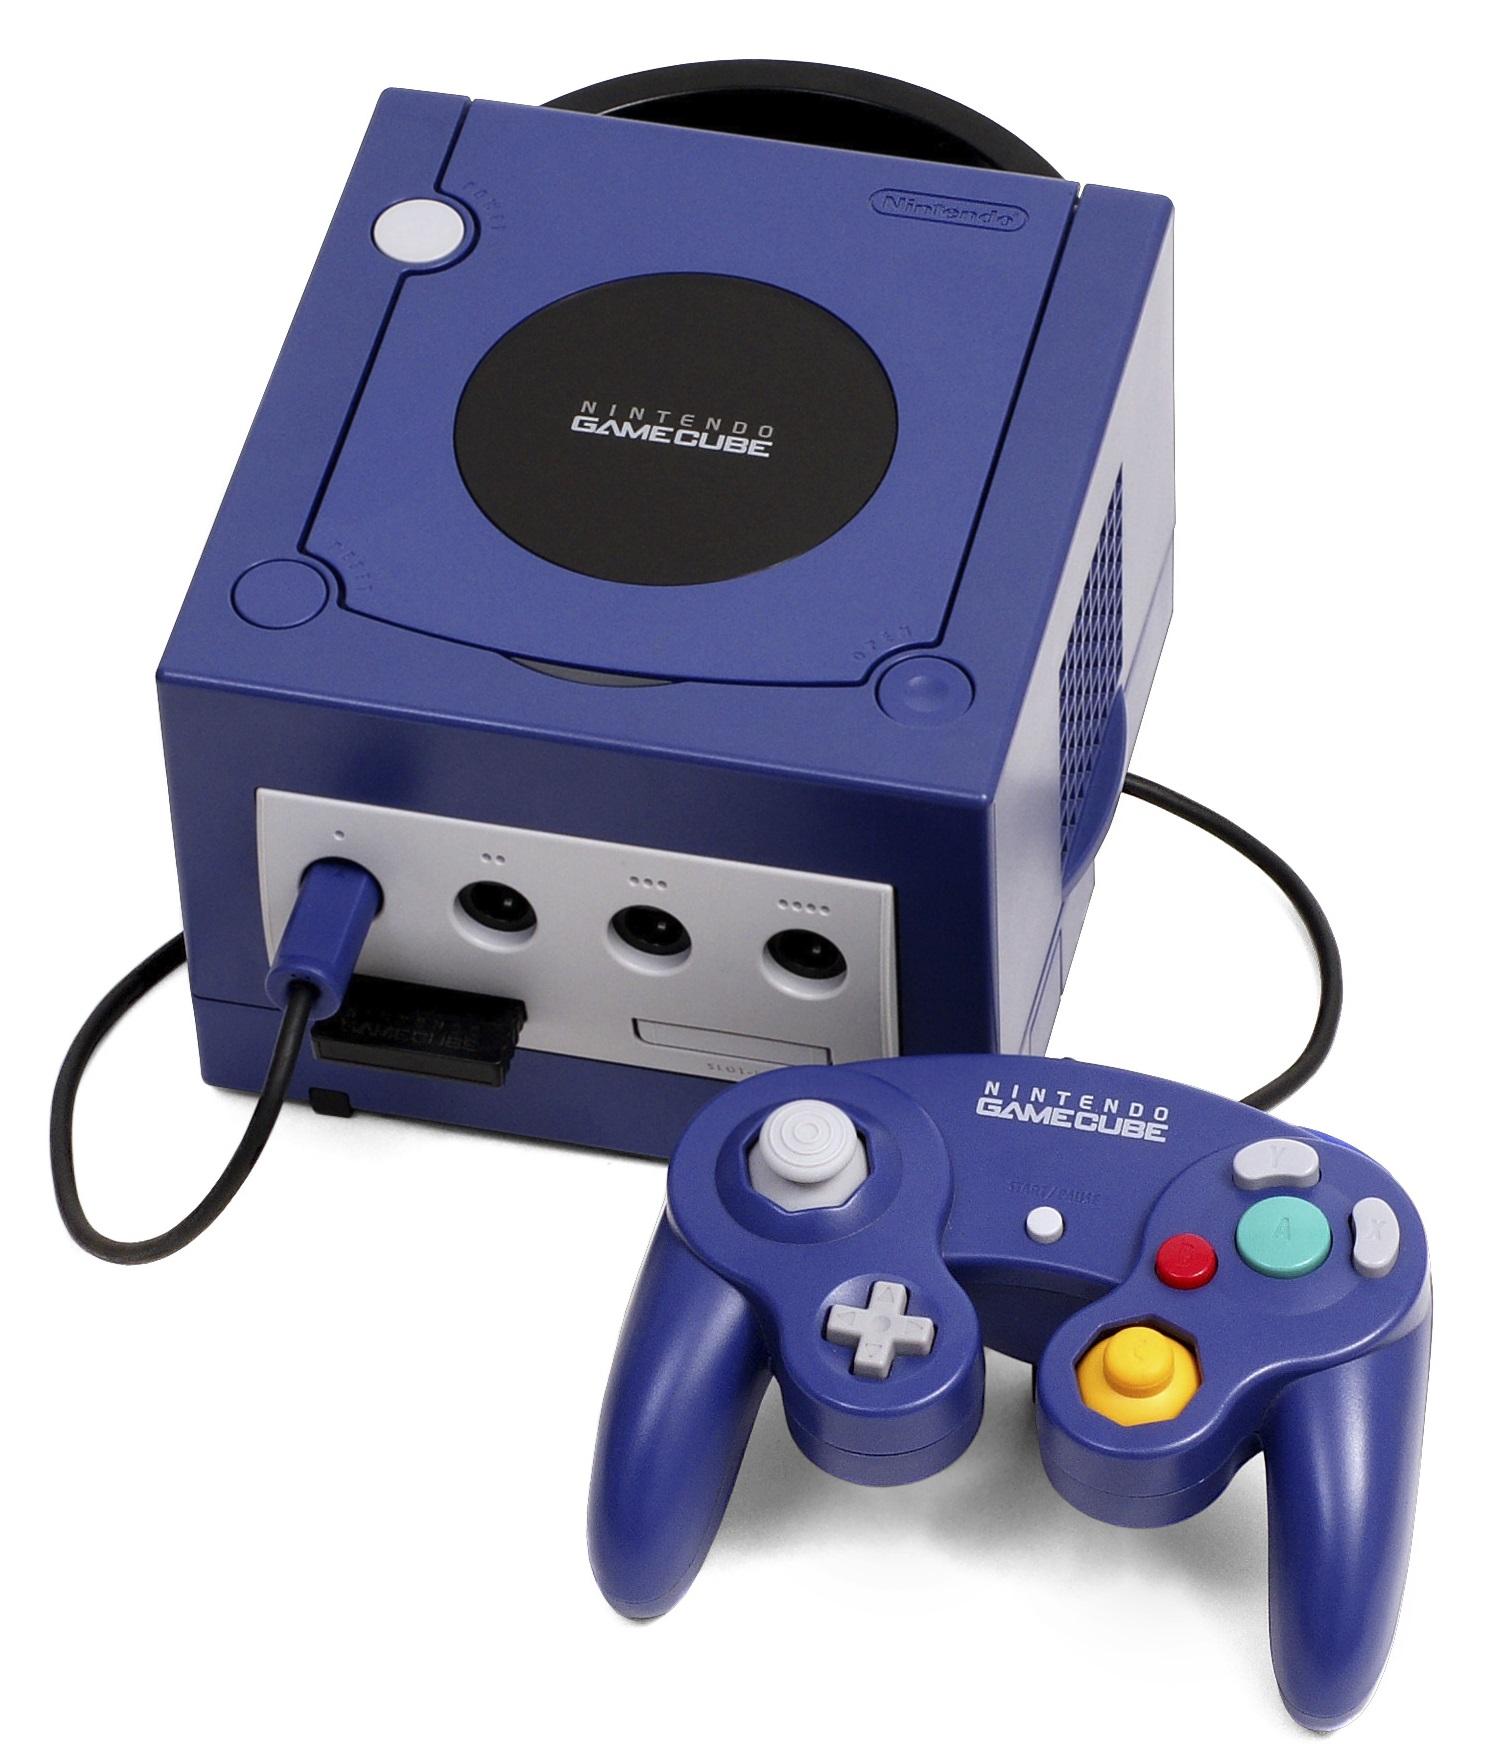 image de la console Gamecube